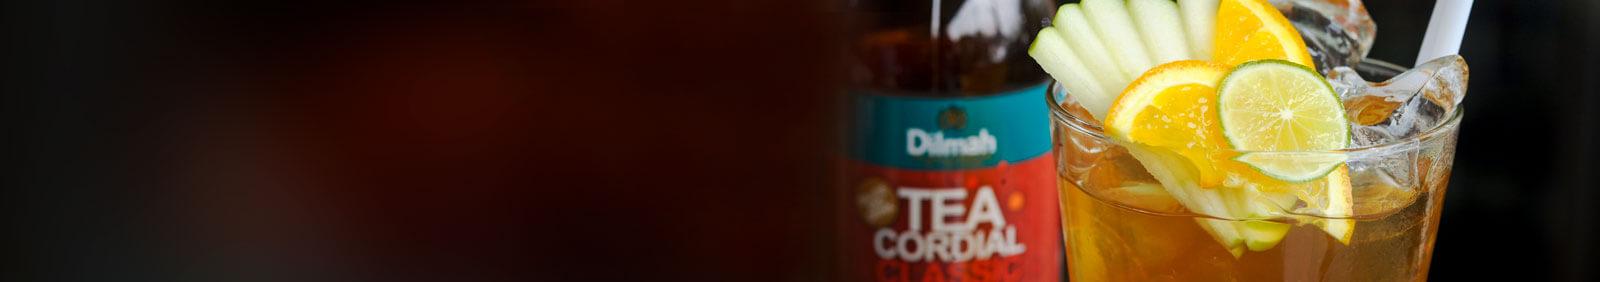 Dilmah Real Tea Cordial